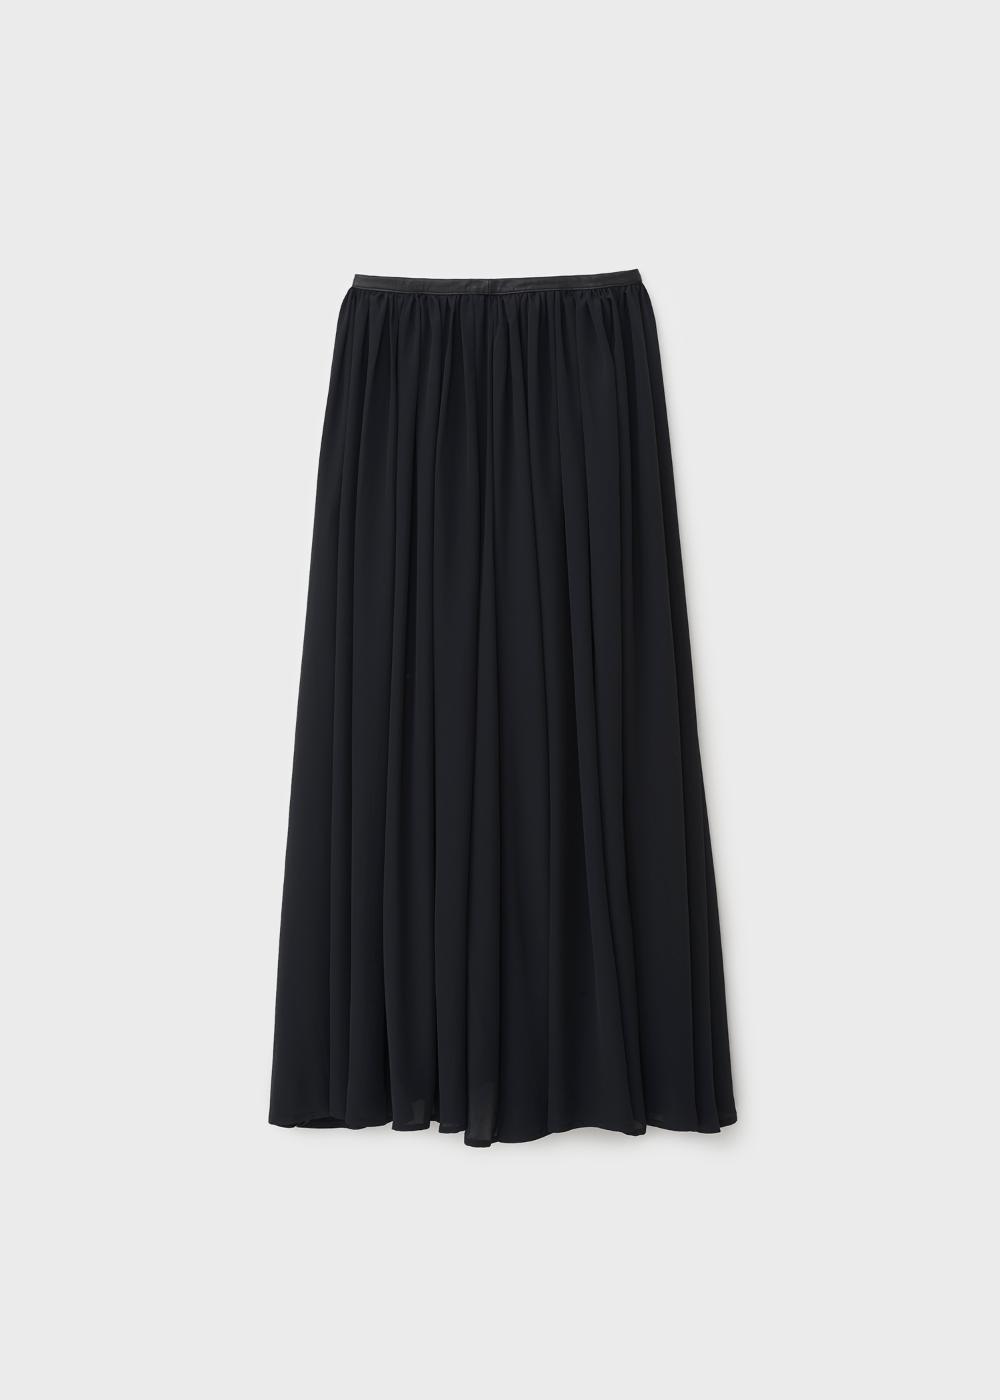 Dresses Skirts Dress Skirt Skirts Silk Skirt [ 1400 x 1000 Pixel ]